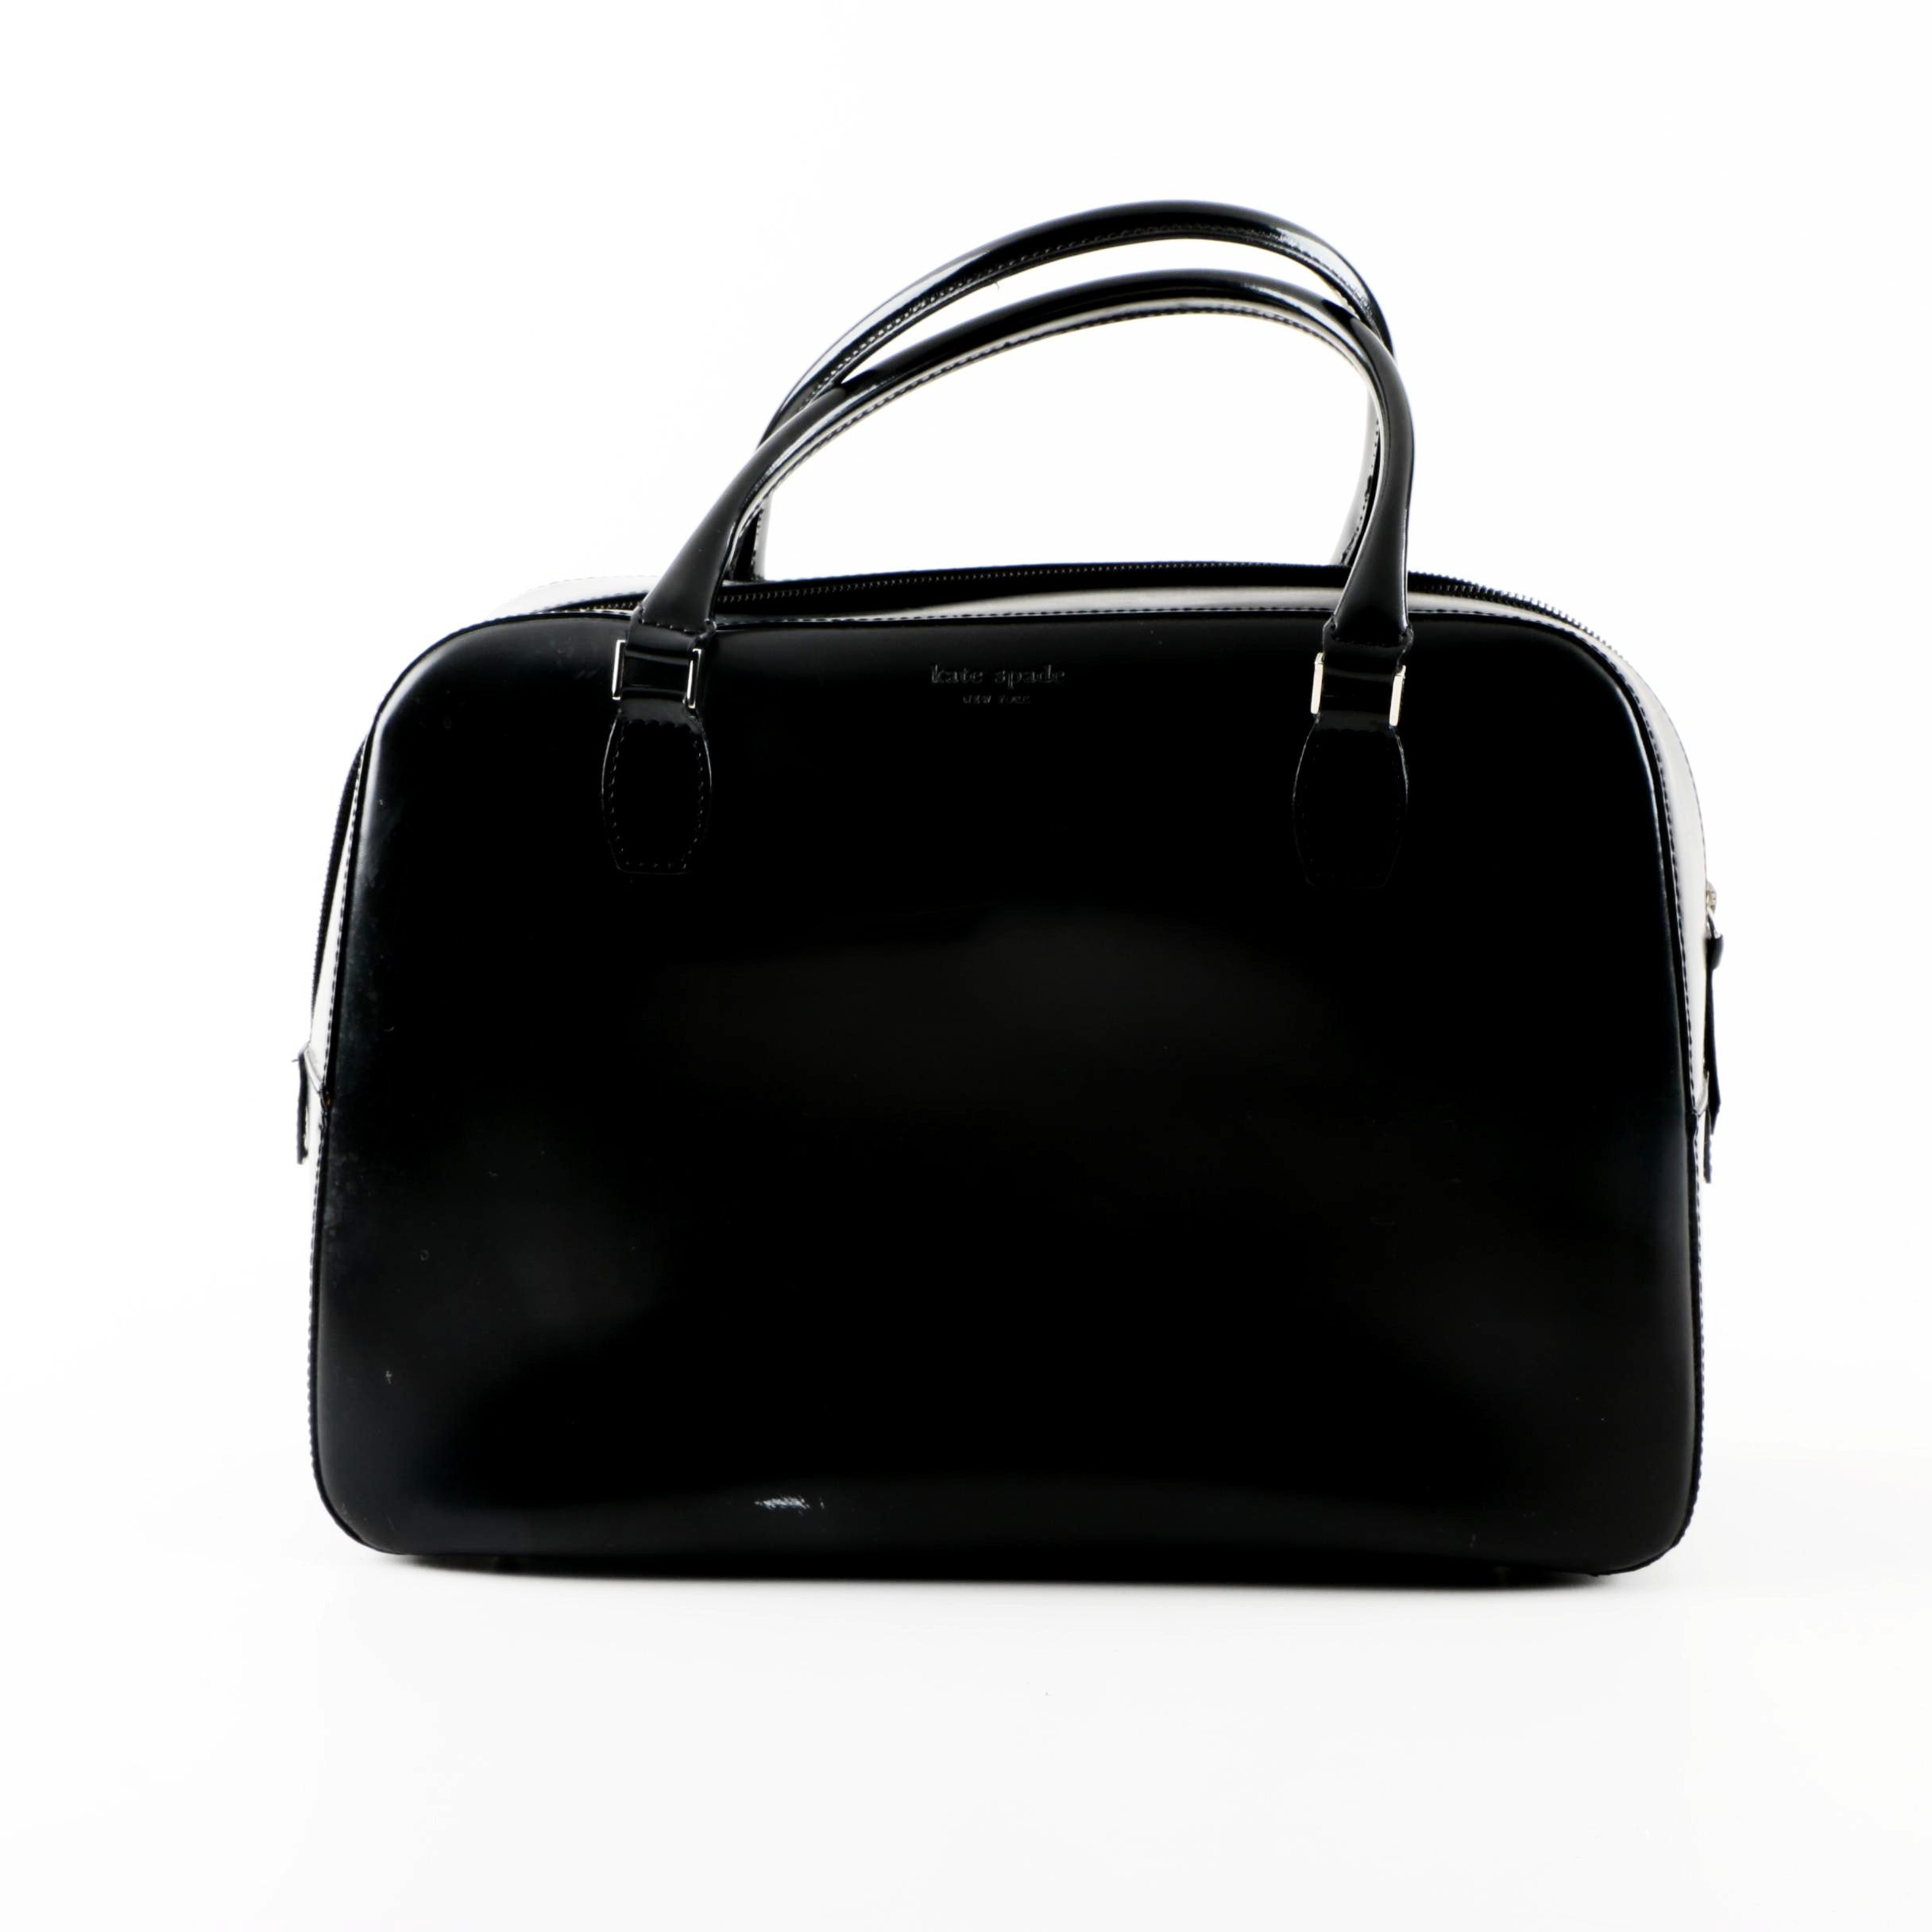 Kate Spade Pressed Black Leather Satchel